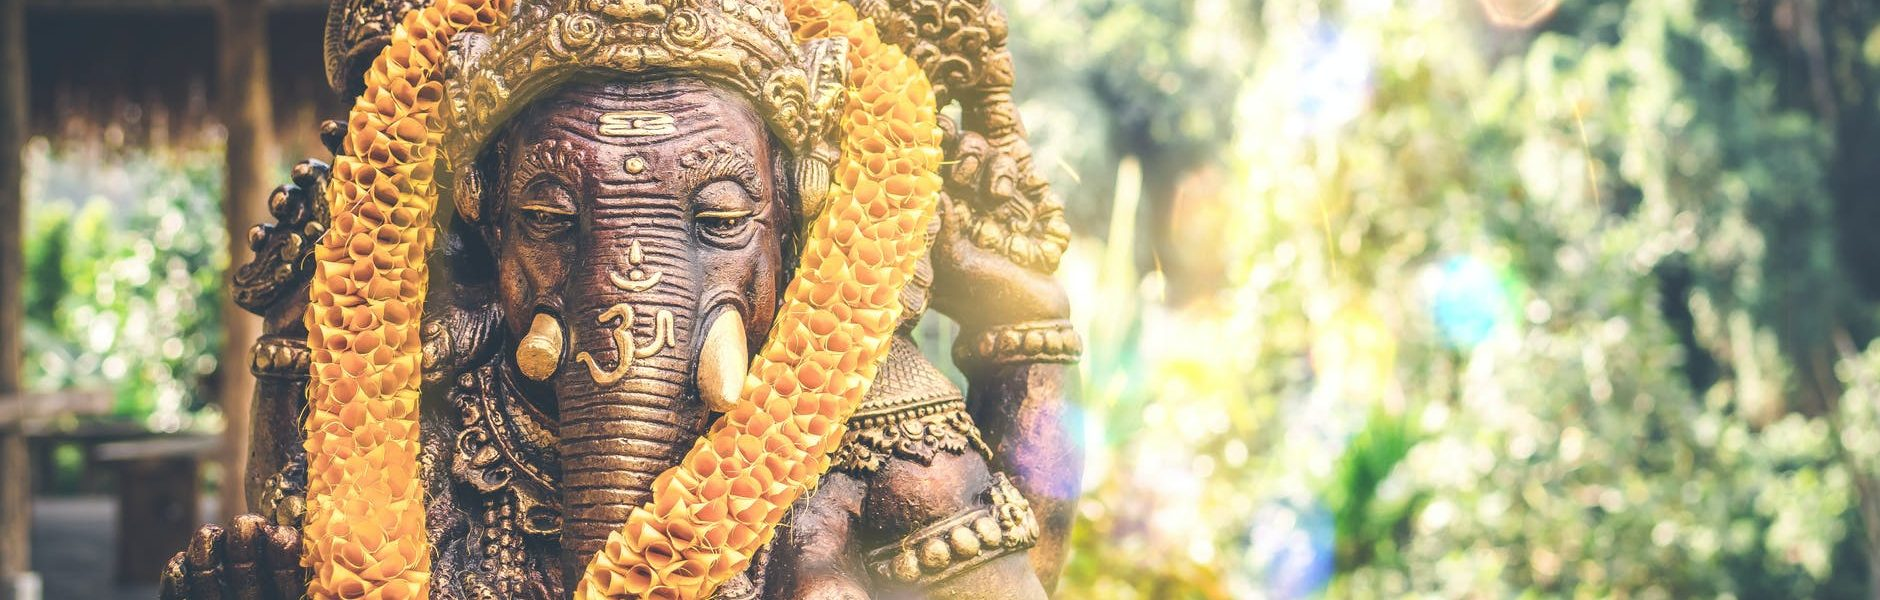 Bóg Słoń